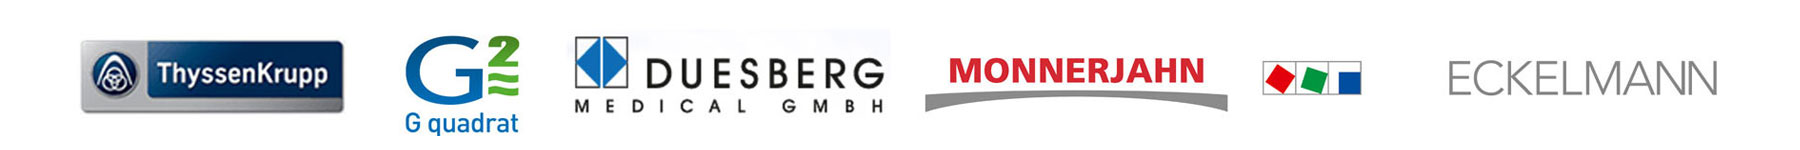 Referenzen SHG AUTOMATION ThyssenKrupp G quadrat Duesberg Monnerjahn Eckelmannn